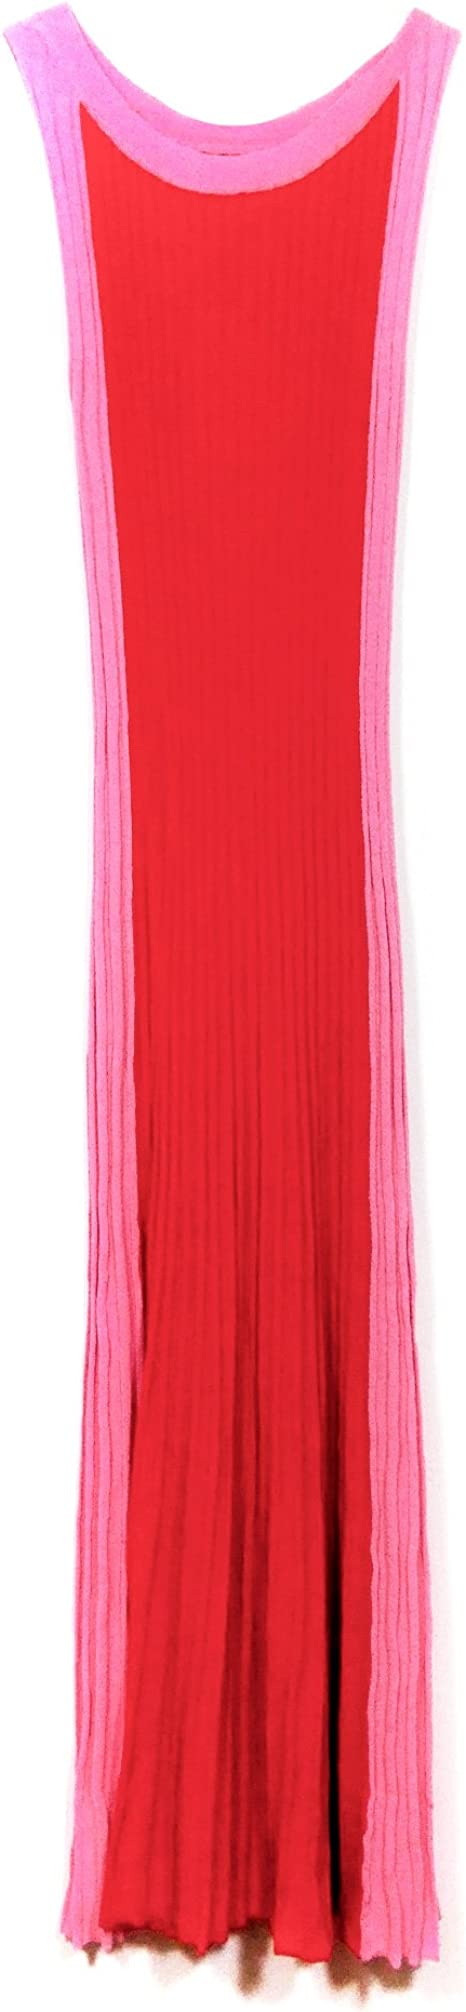 Zara - Camiseta de manga larga - para mujer Rojo rosso L ...